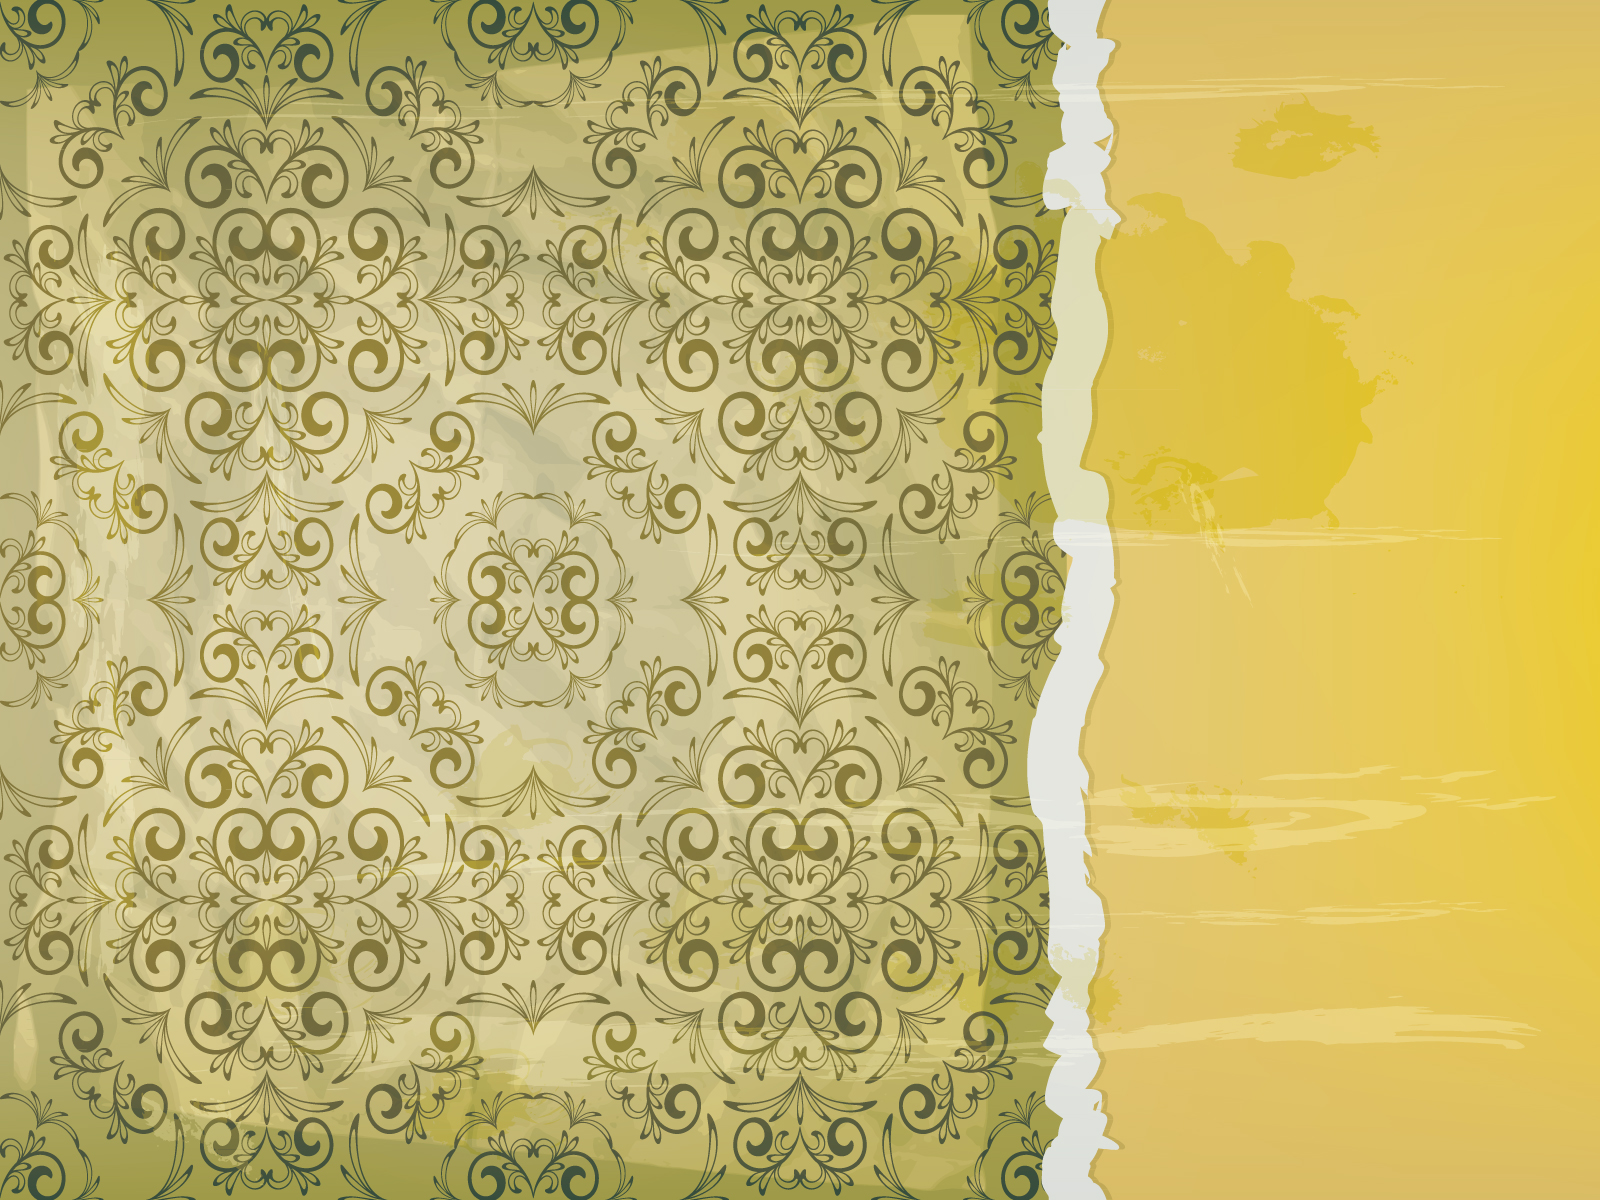 Cartoon Design for Pattern Backgrounds